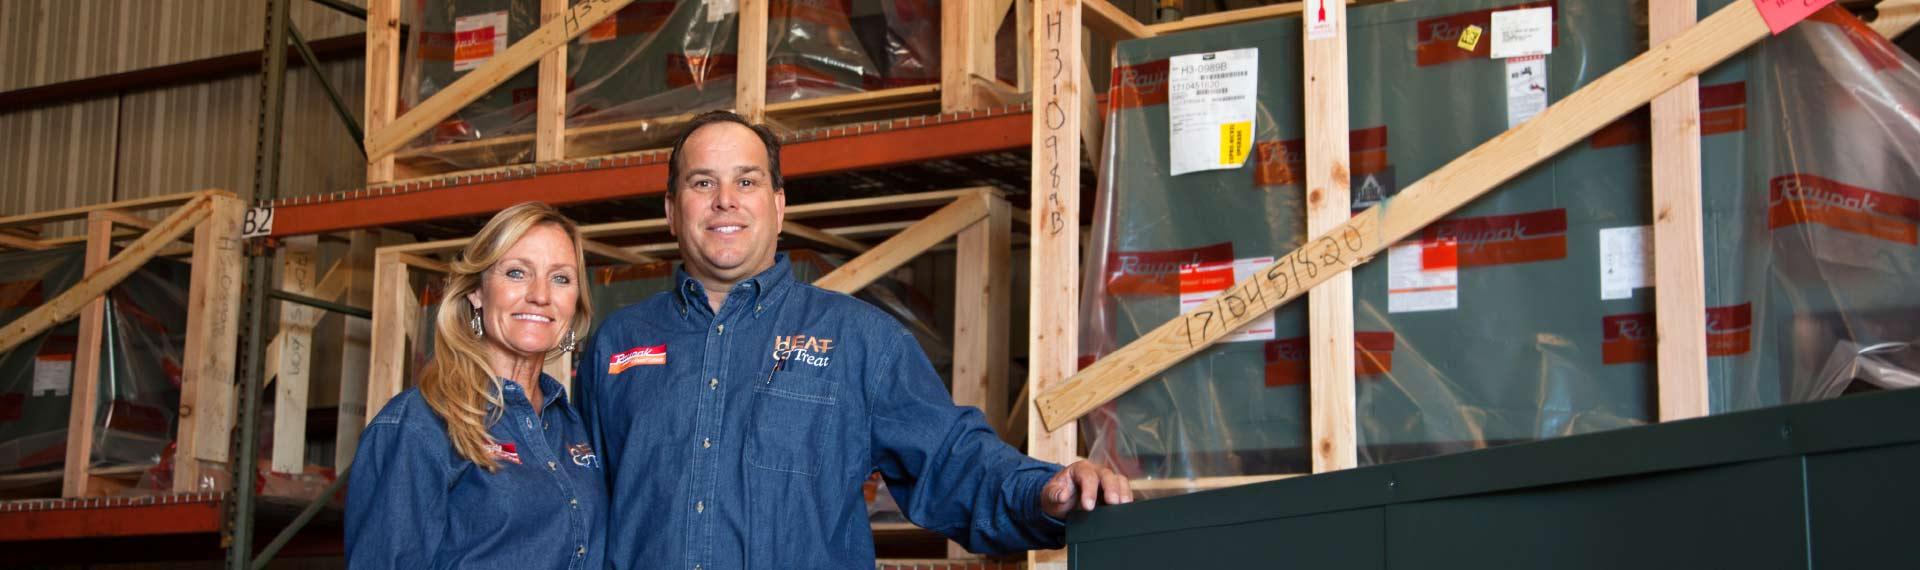 Raypak boilers| hydromatic pumps | commercial water softeners | Heat & Treat owners | Glenn Johnson | Heat & Treat Texas